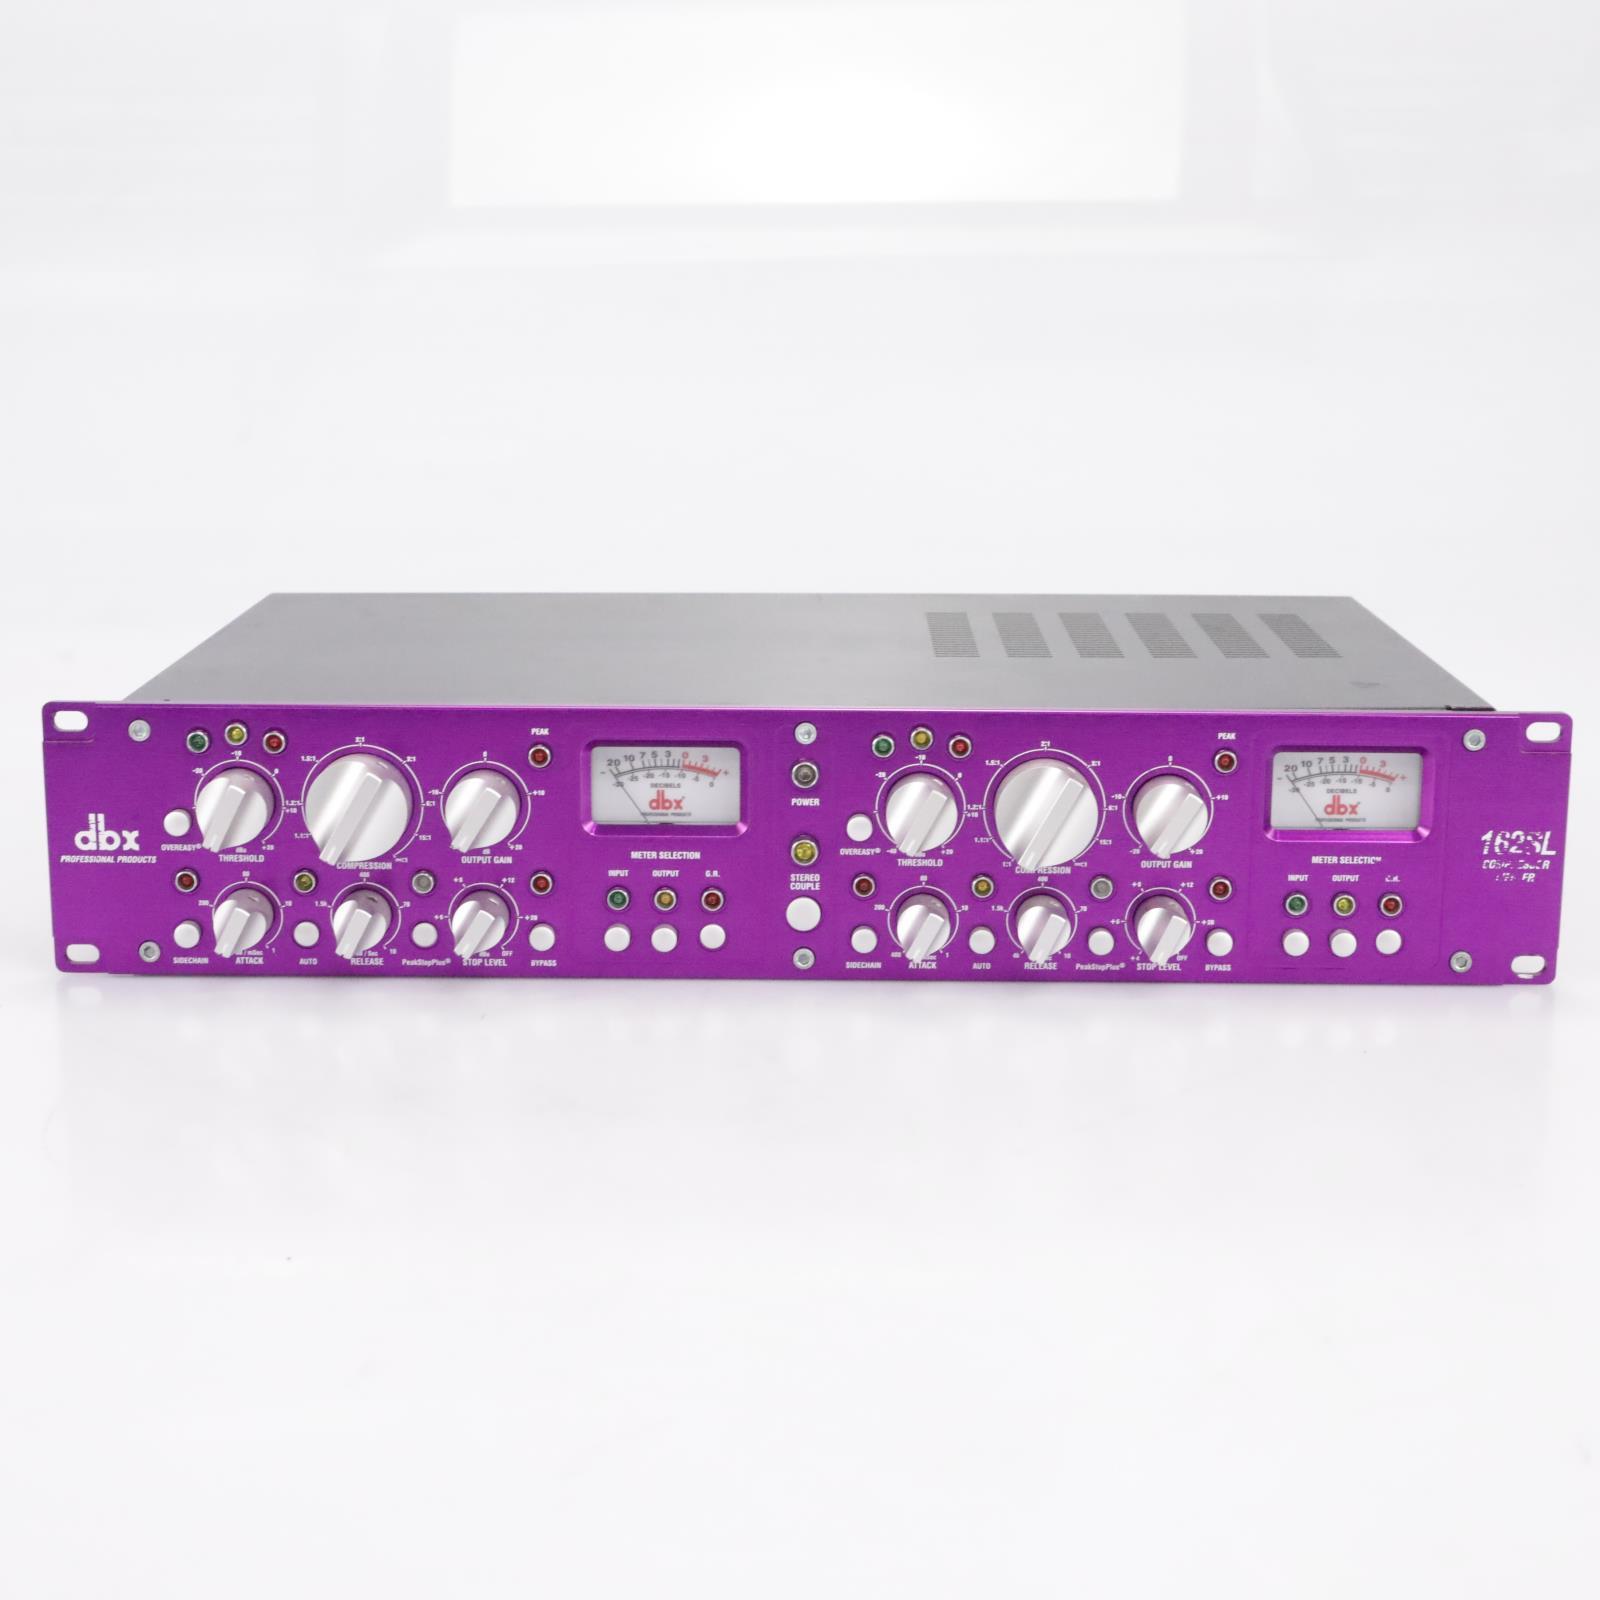 DBX 162SL 2-Channel Compressor / Limiter #43816